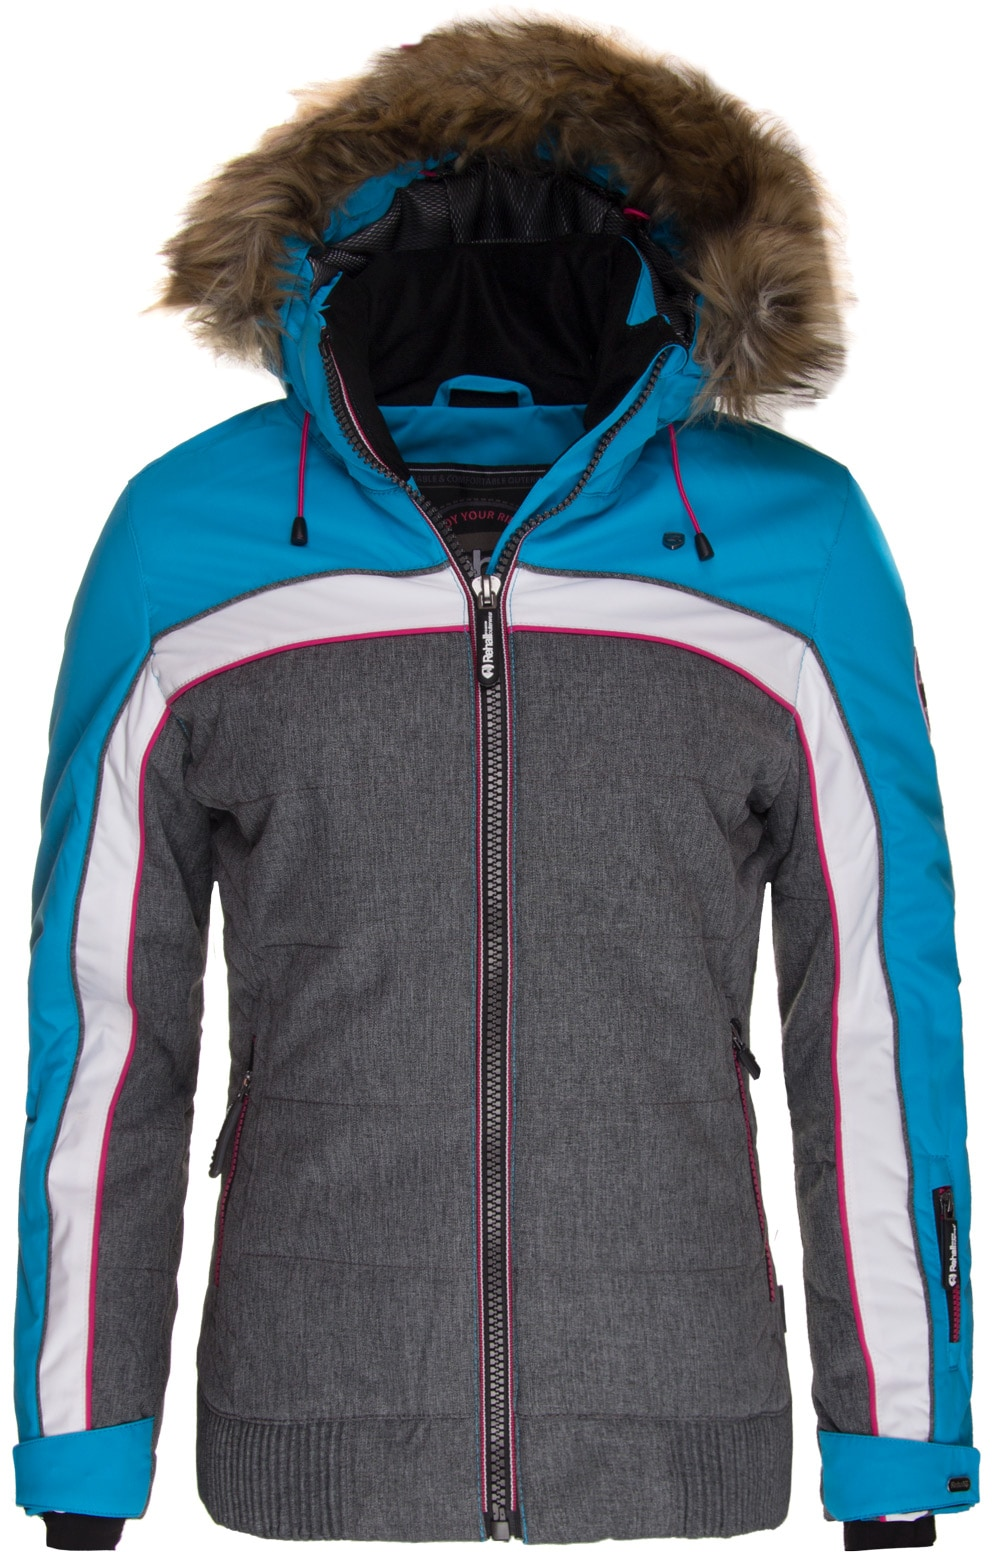 Ski jacket women's Rehall KATE-R-fur